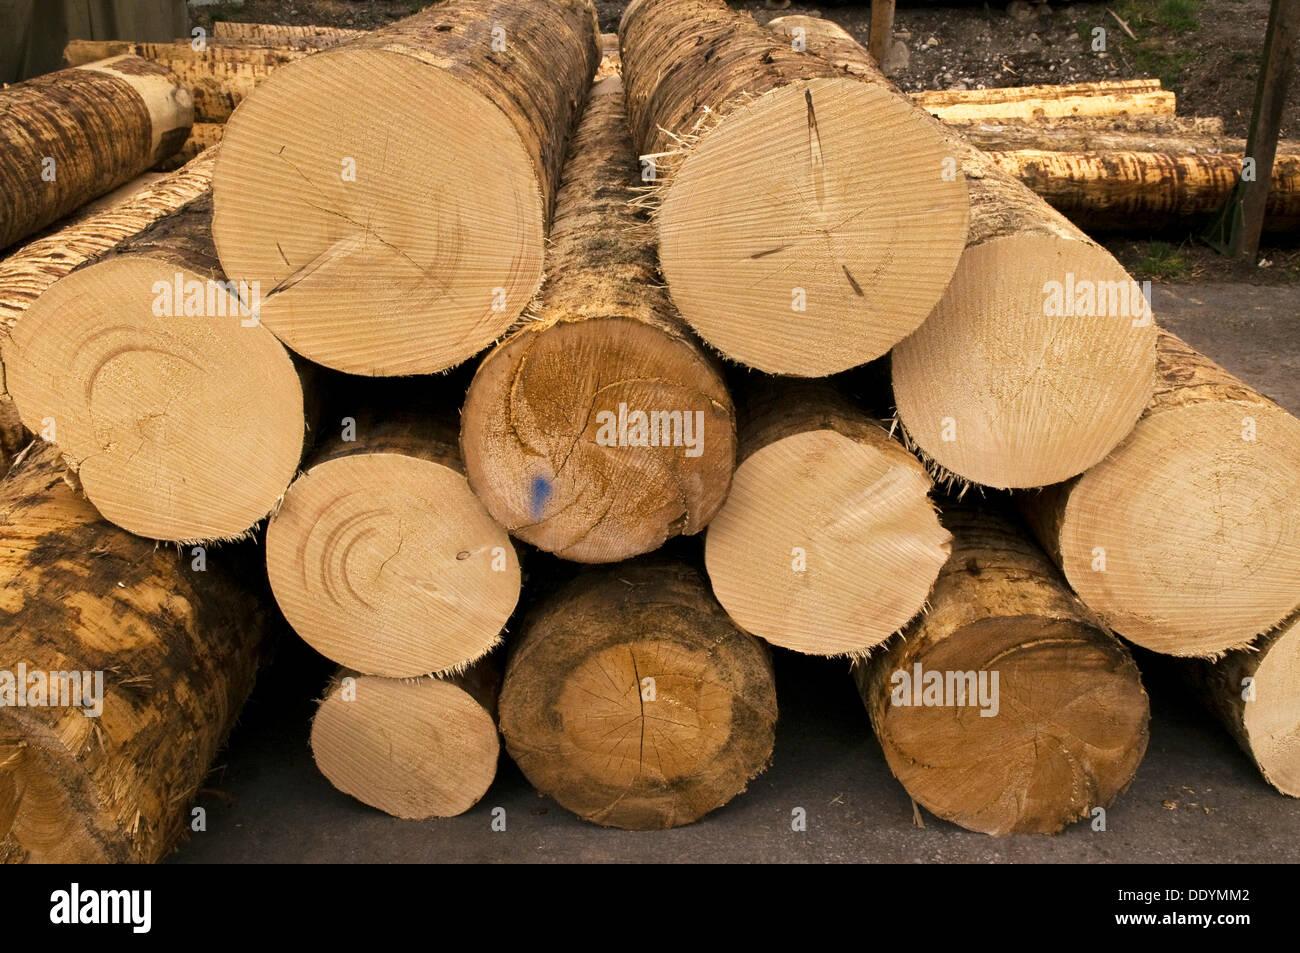 Sägewerk Holzhandel Protokolle Holzlagerung Holz Bauholz